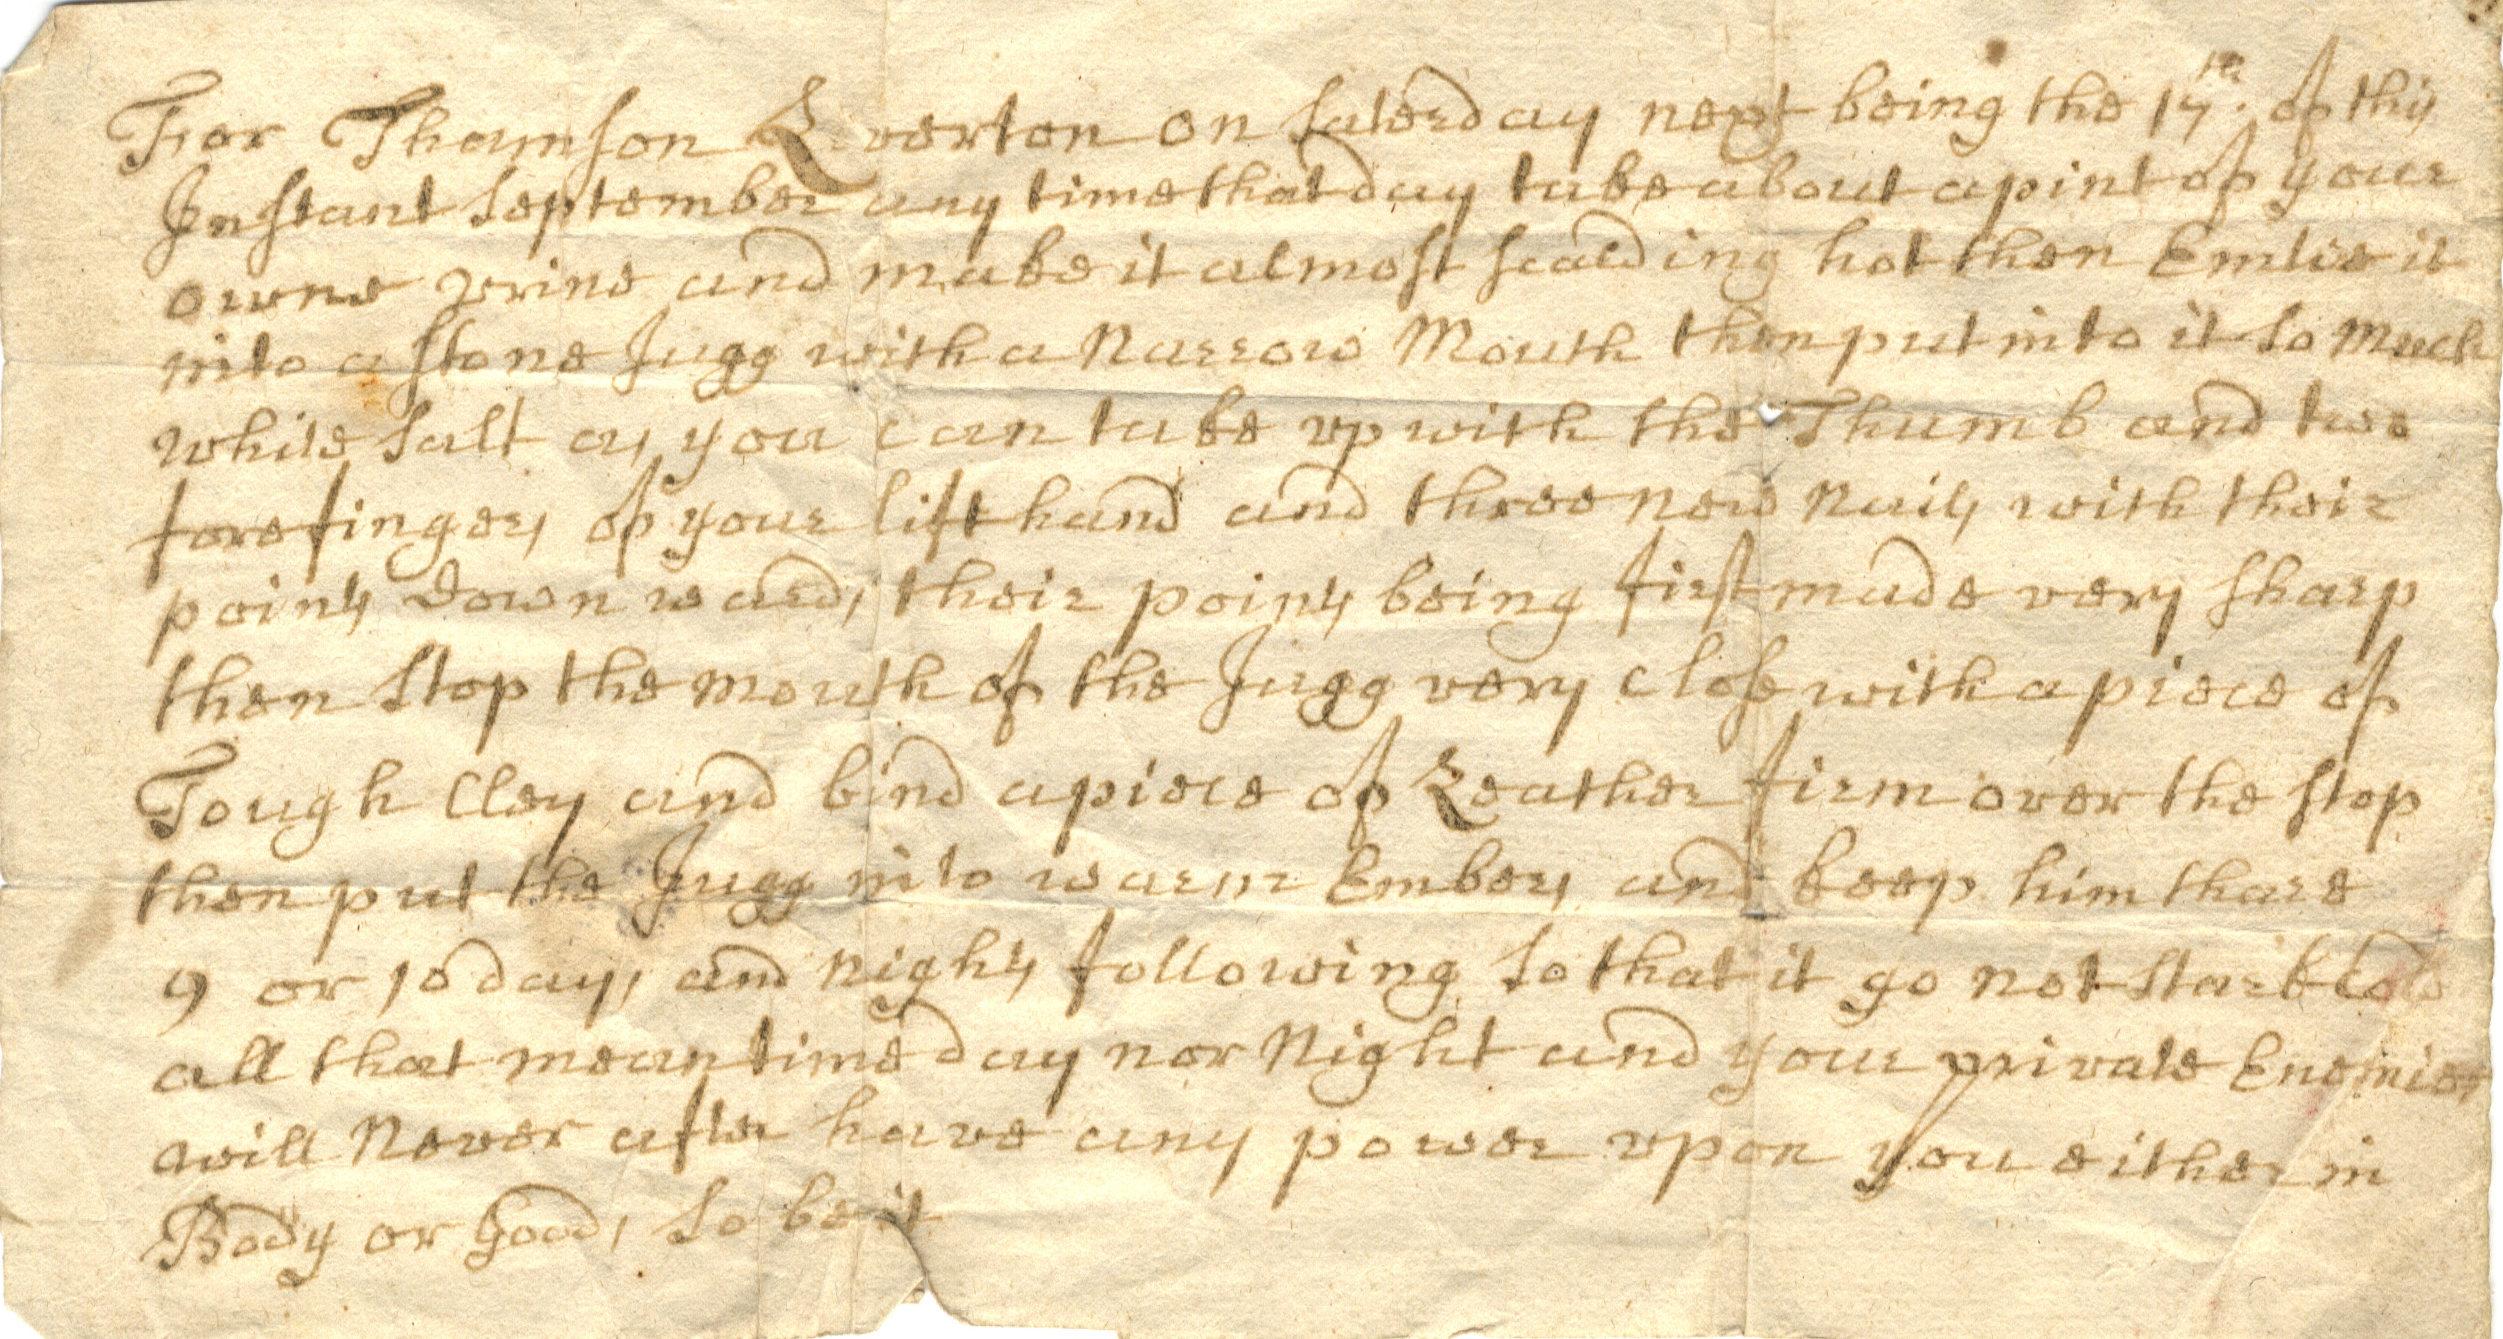 Scan of a handwritten spell describing the creation of a witch-bottle.